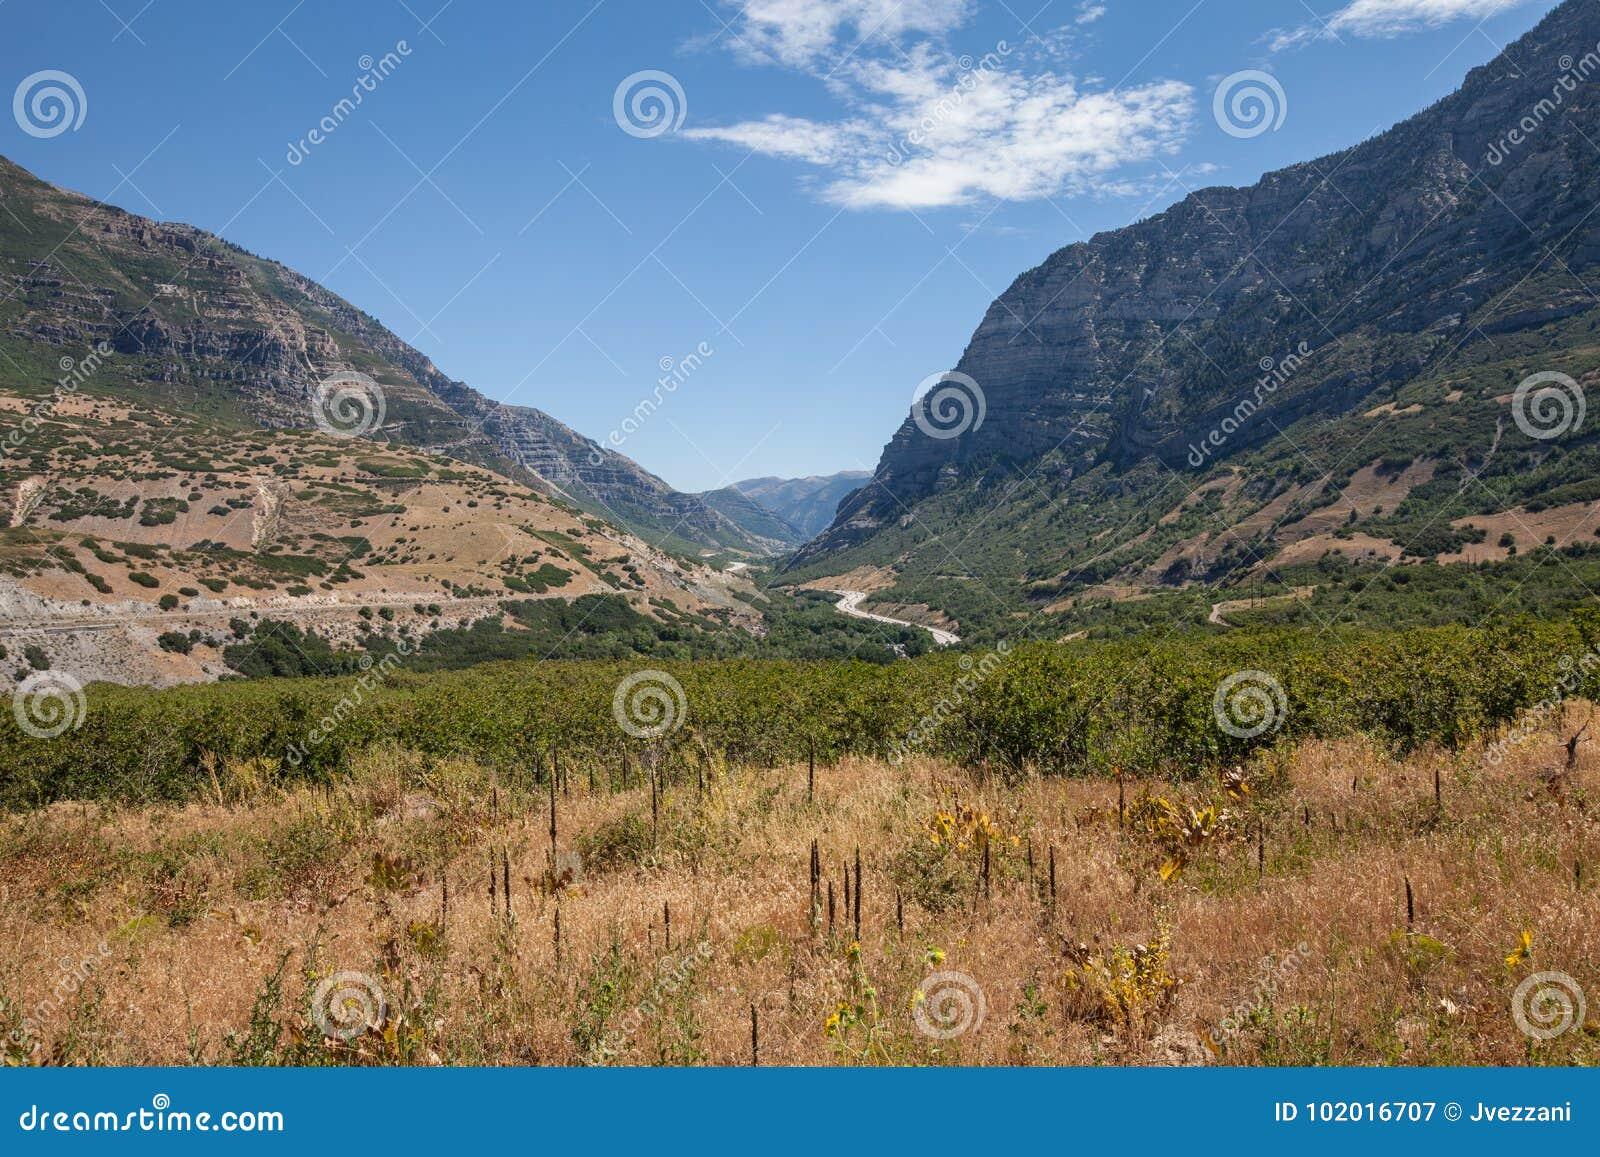 Provo Canyon horizontal shot